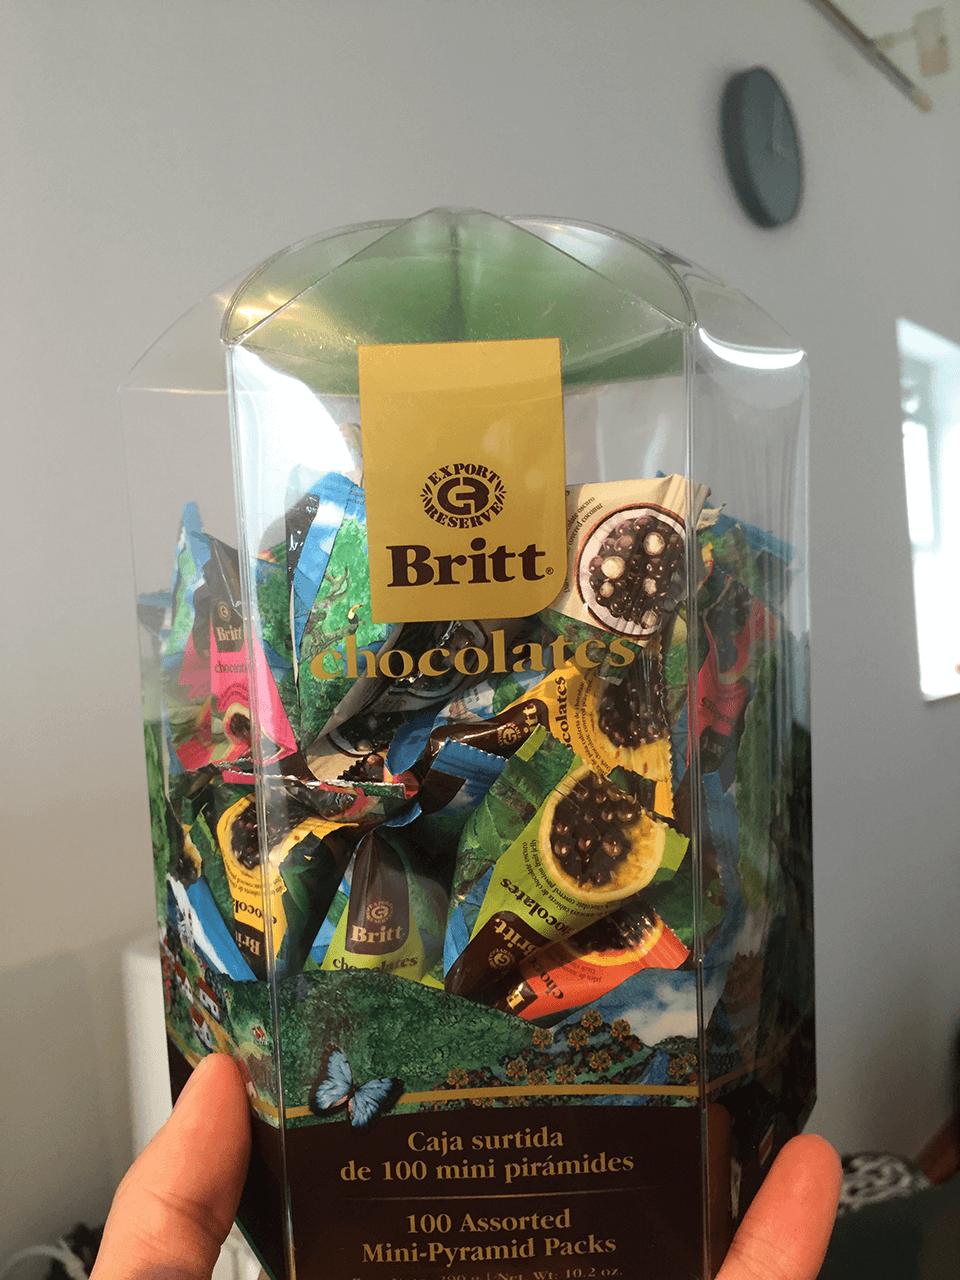 costarica souvernir britt chocolates